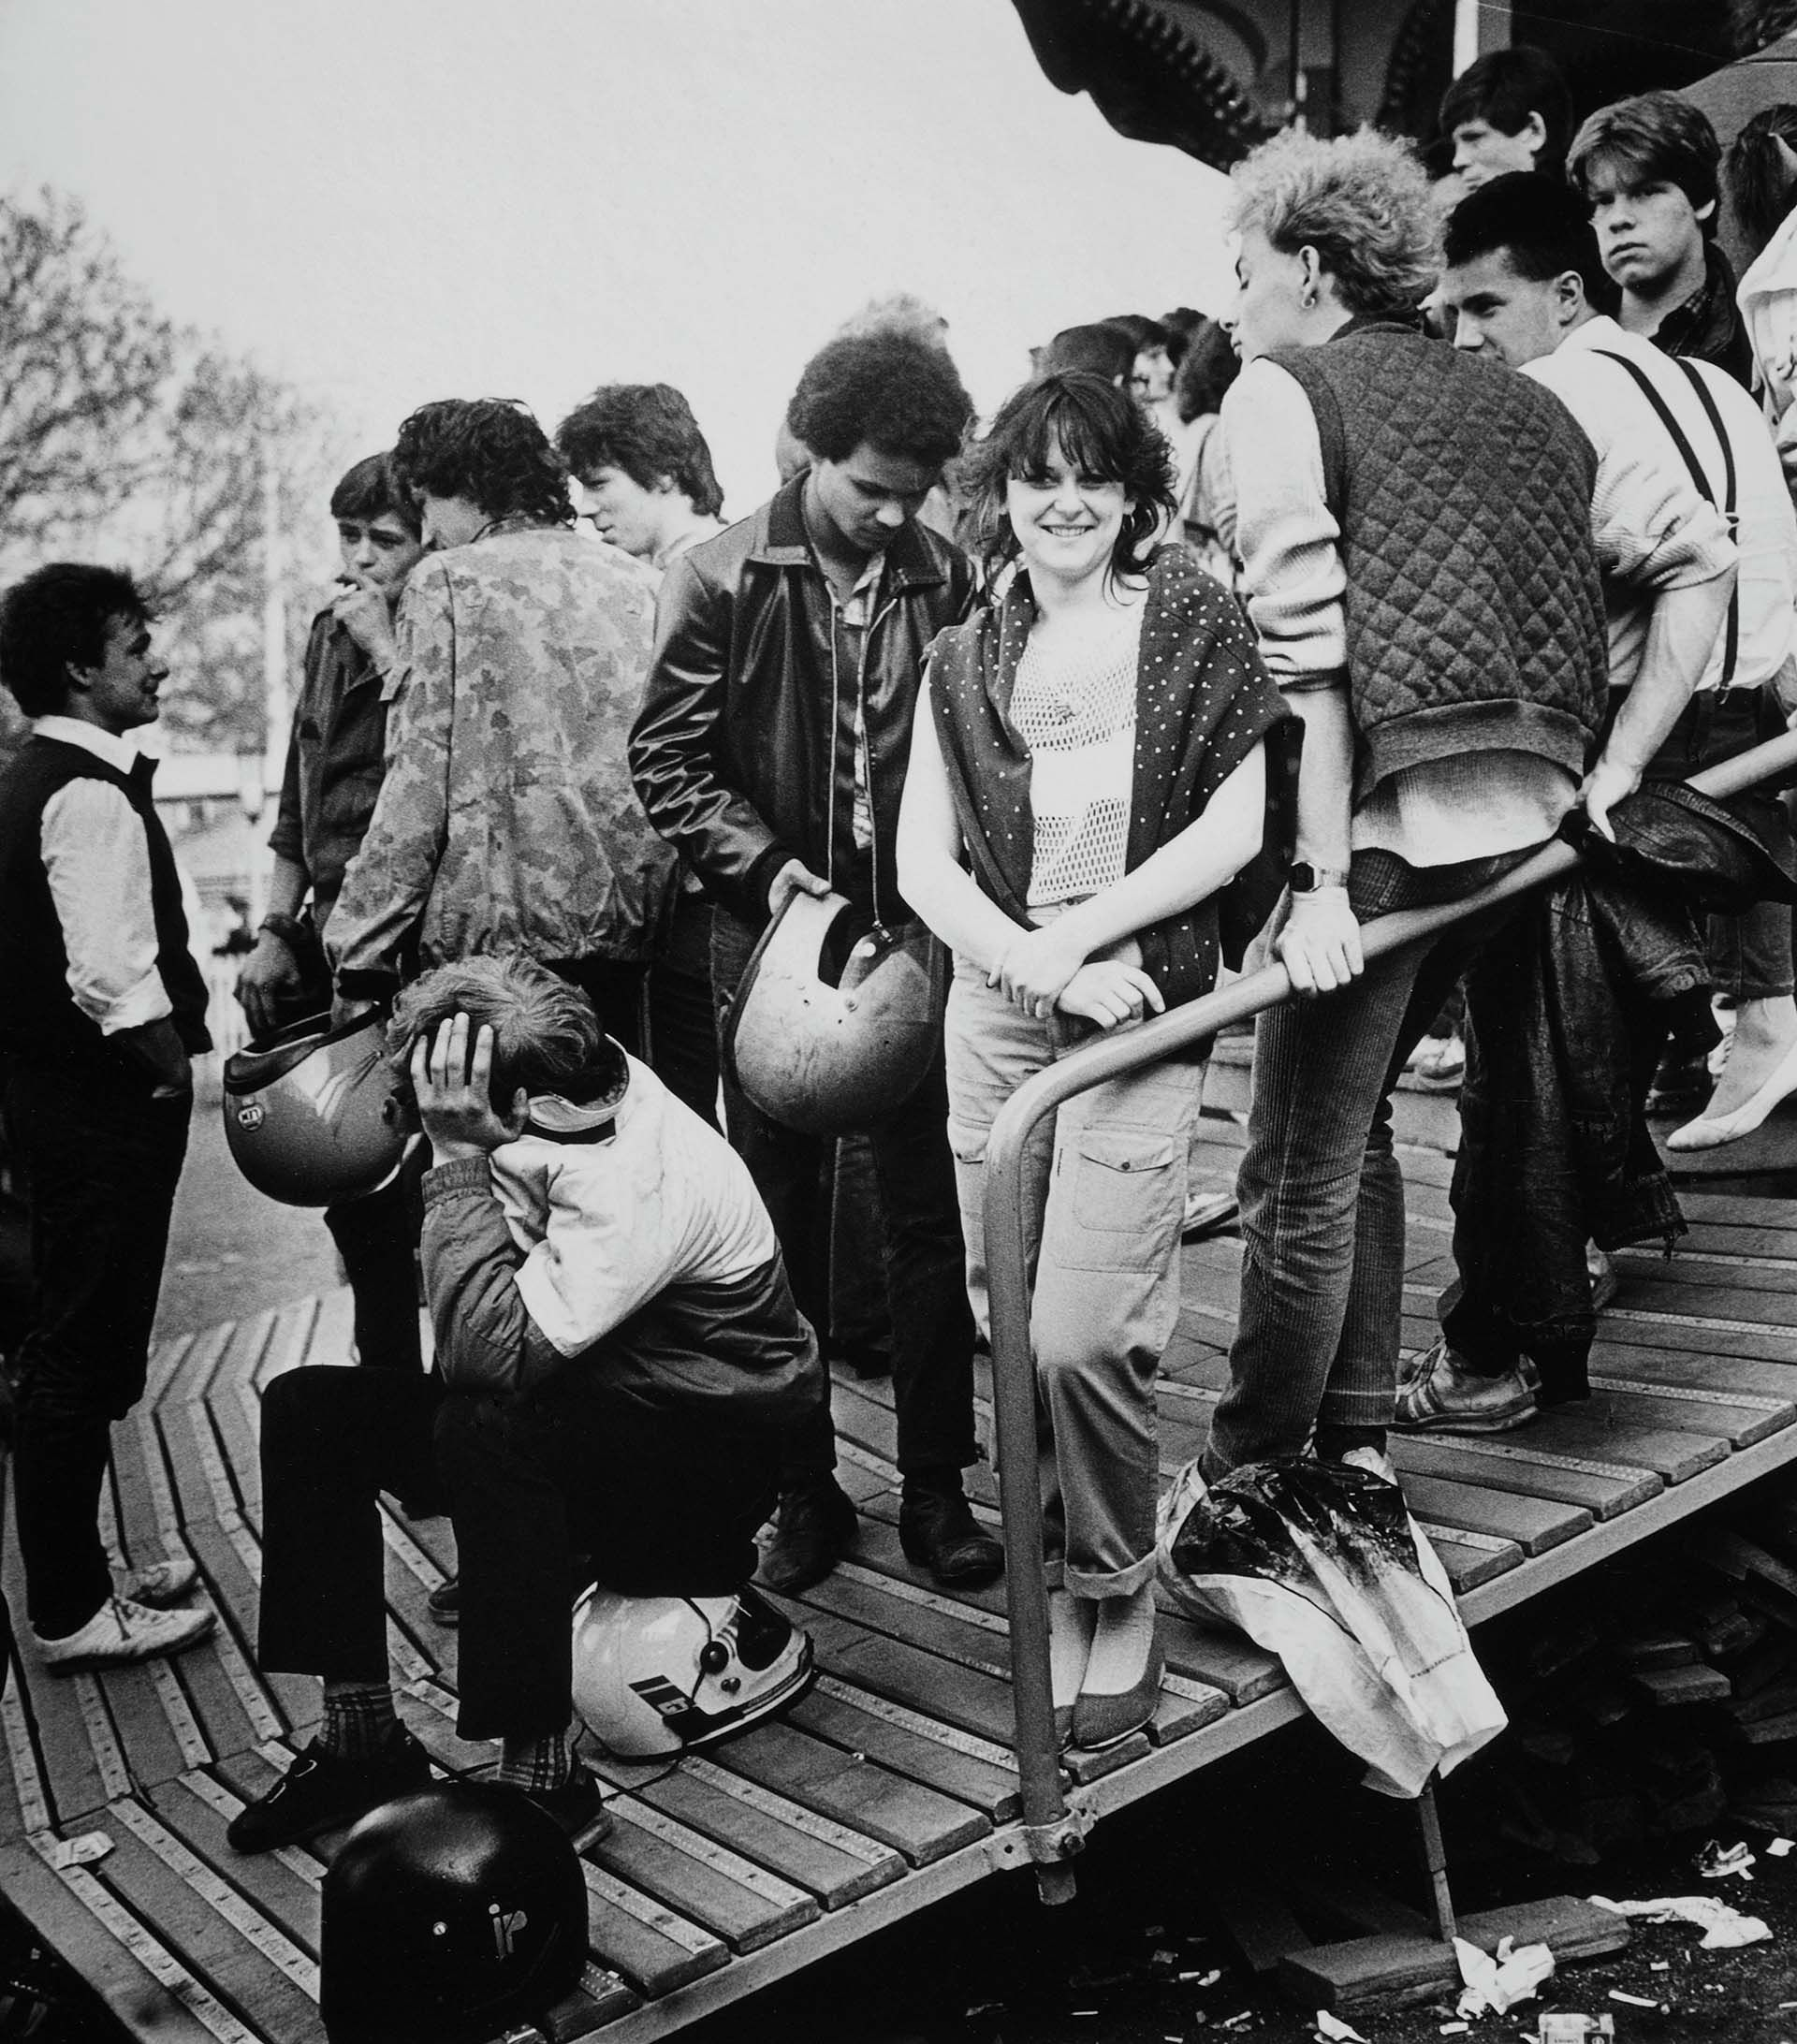 Jóvenes en una Feria en Leipzig, cerca de 1982 (Photo by Michael Nitzschke/imageBROKER/Shutterstock)